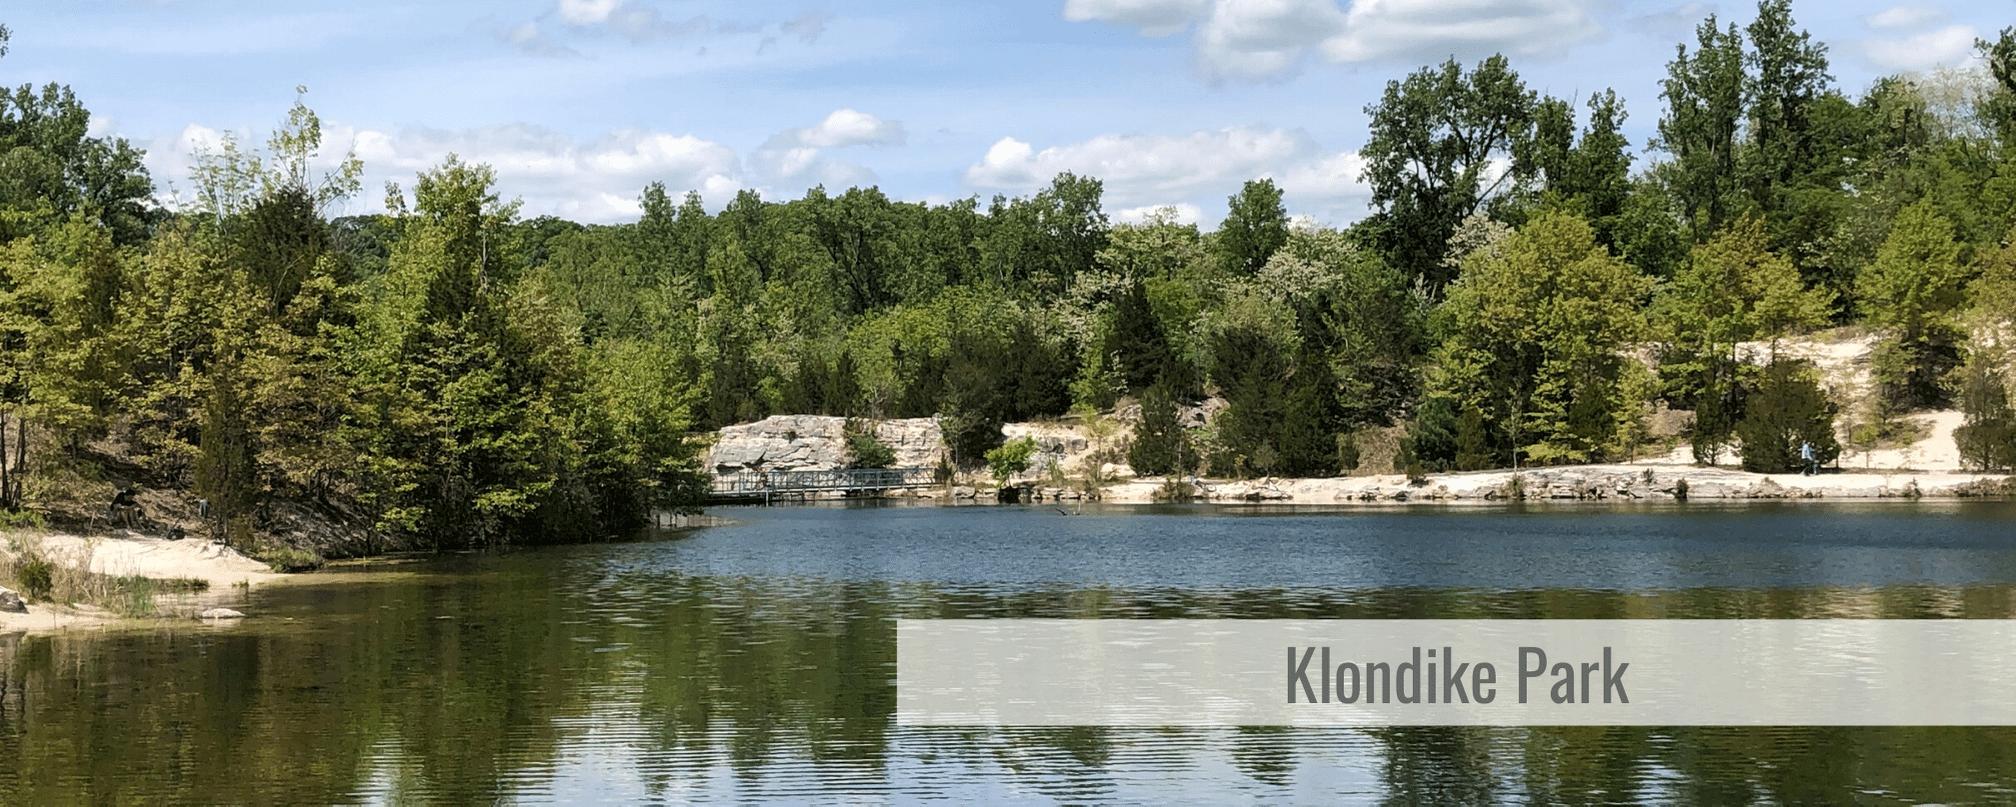 Klondike Park in St. Charles County